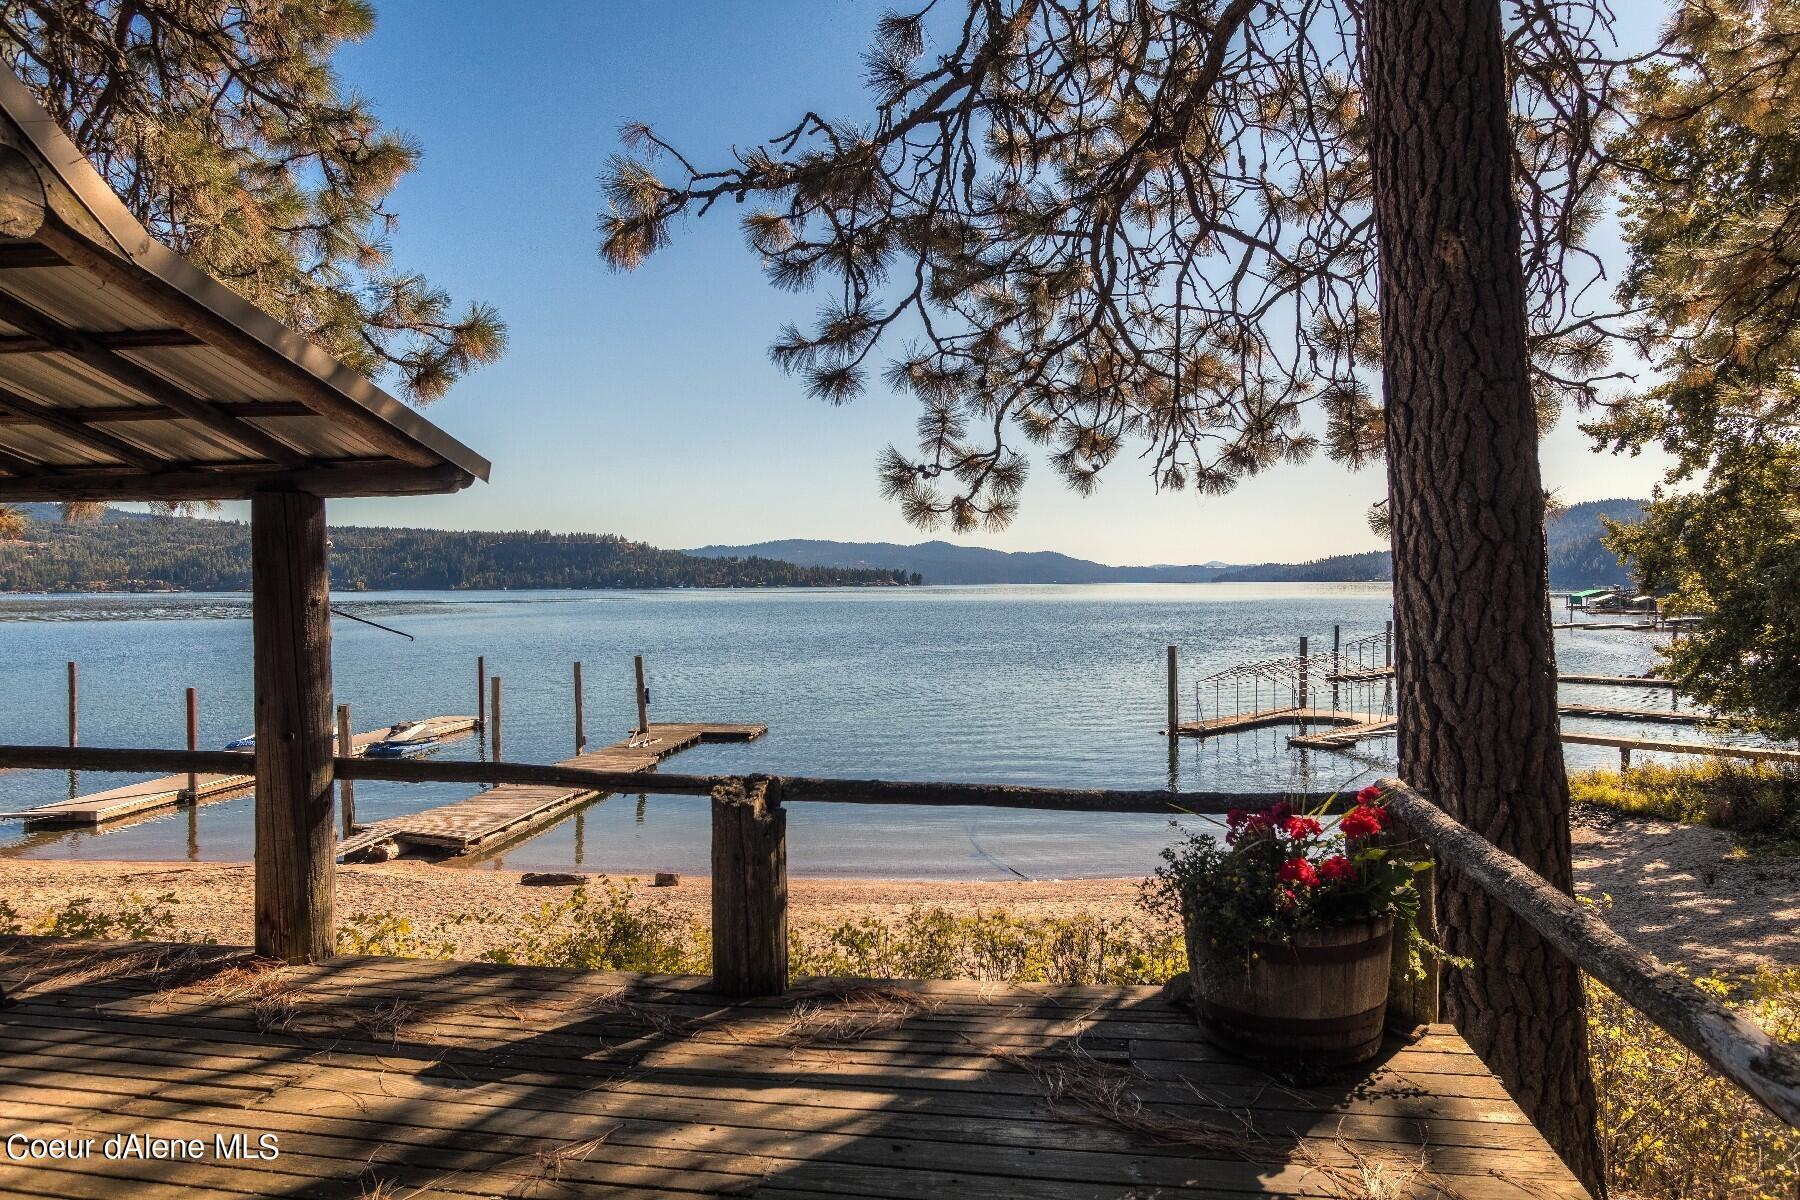 photo of 1460 W Swede Bay Rd Coeur d'Alene Idaho 83814